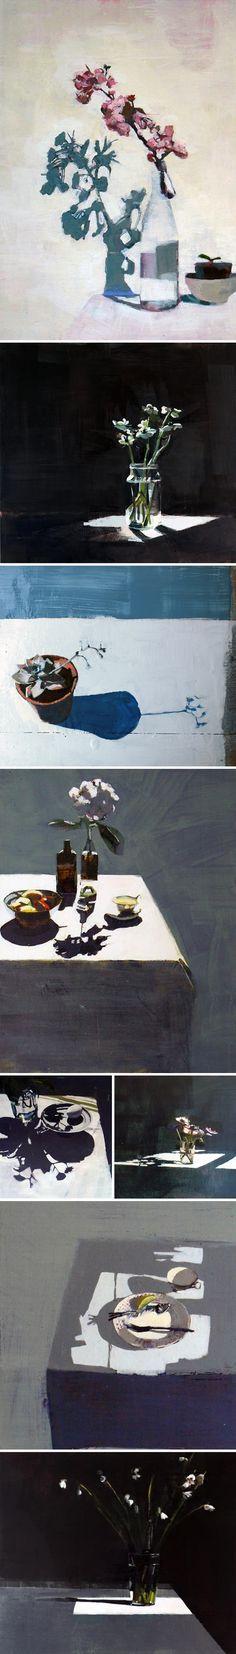 Oil paintings by Susan Ashworth